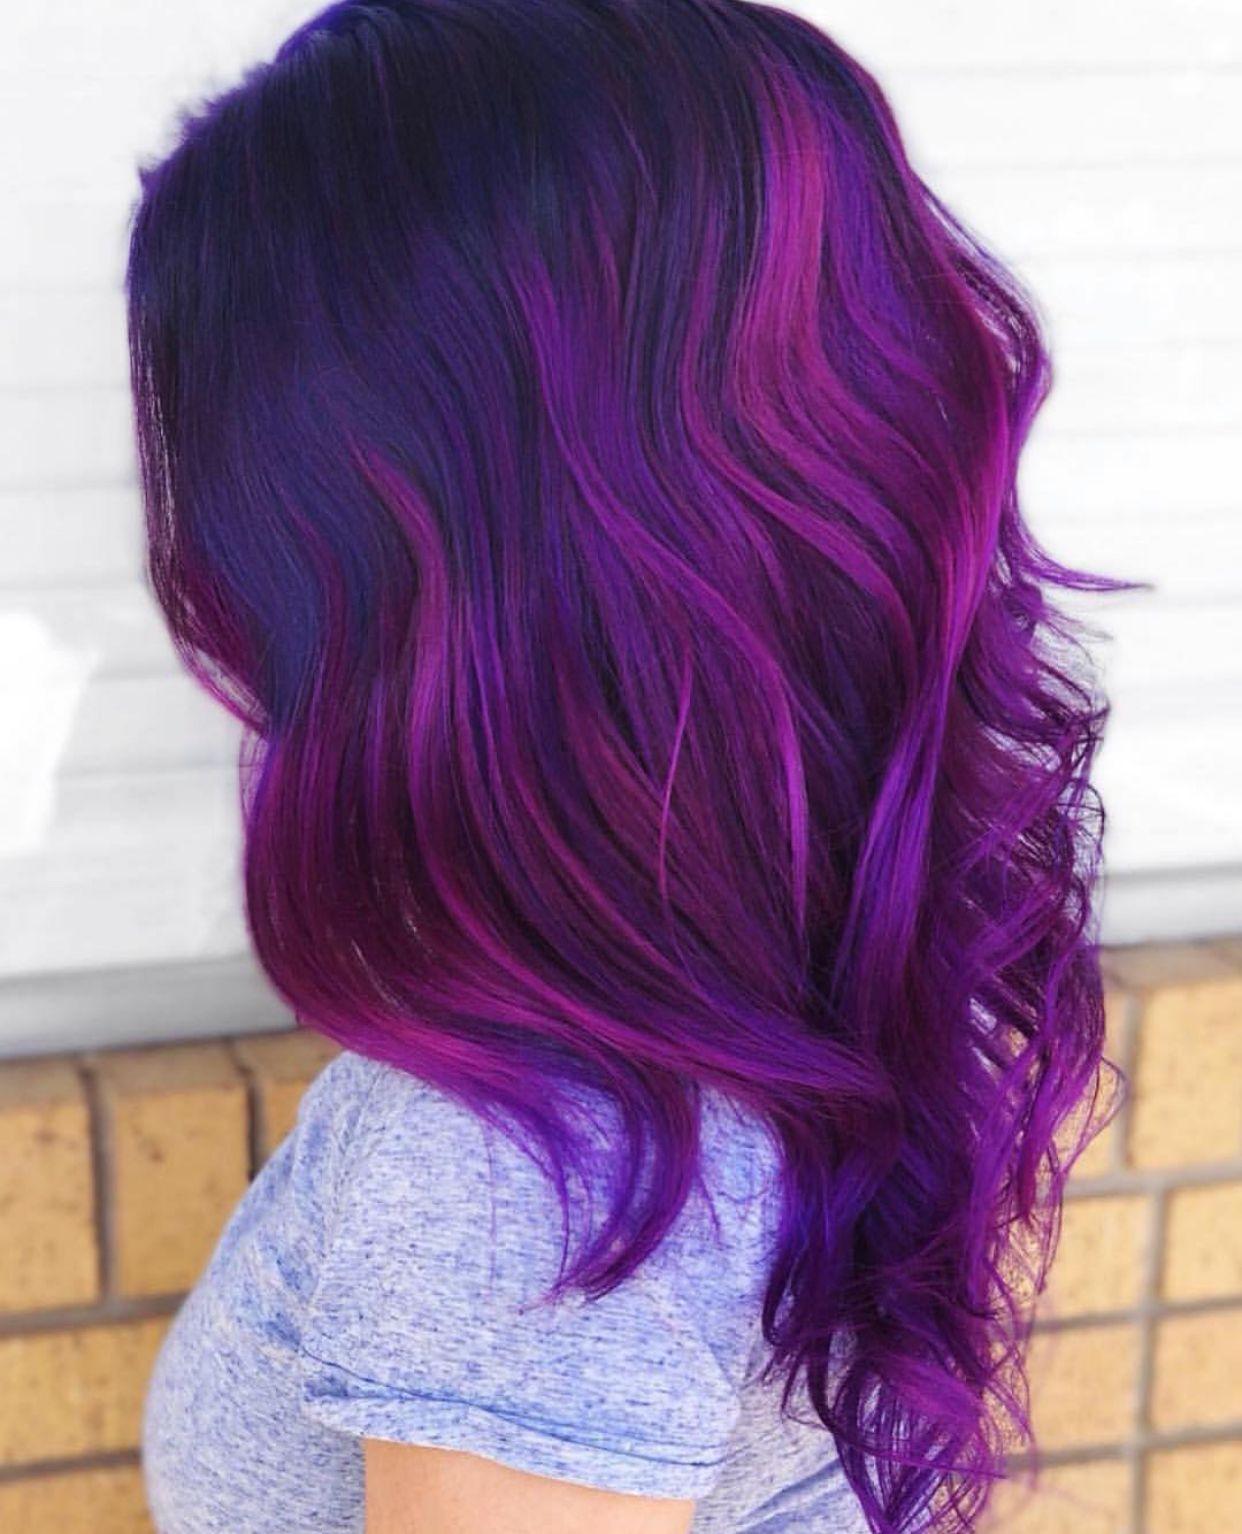 63 Purple Hair Color Ideas To Swoon Over Violet Purple Hair Dye Tips: Pin By Katlynn Thornton On Hair Dye